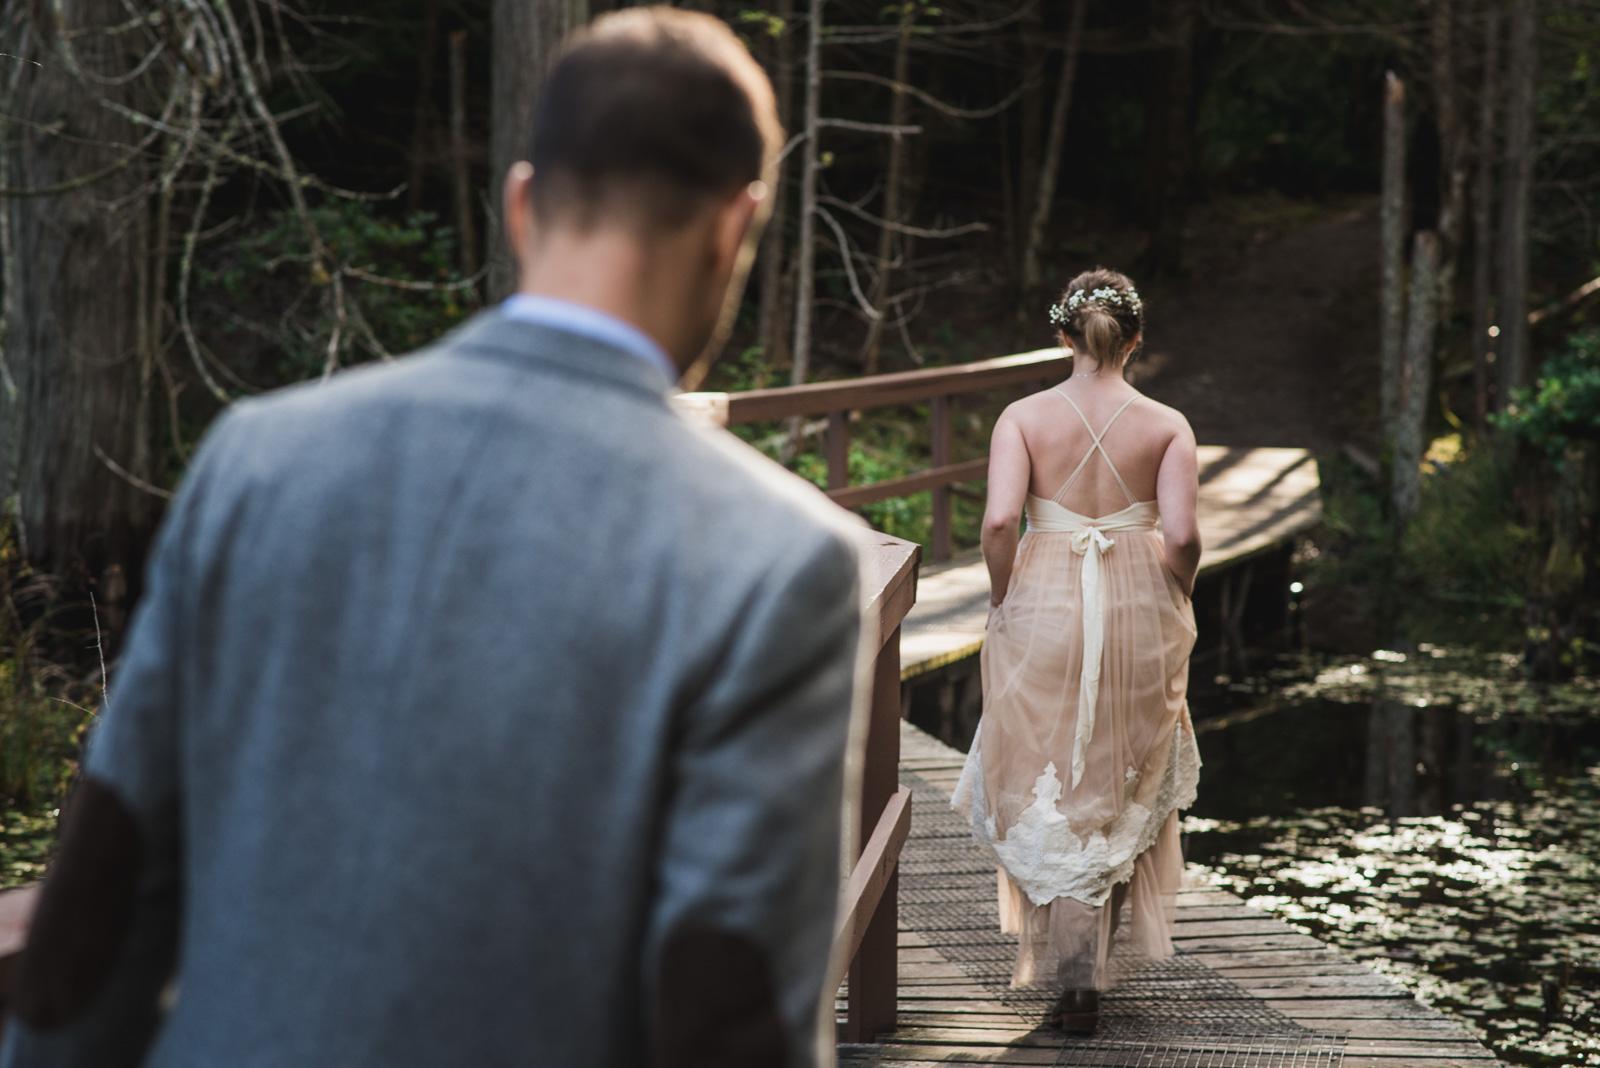 vancouver-island-wedding-photographers-cliff-gilker-park-smugglers-cove-elopement-23.jpg